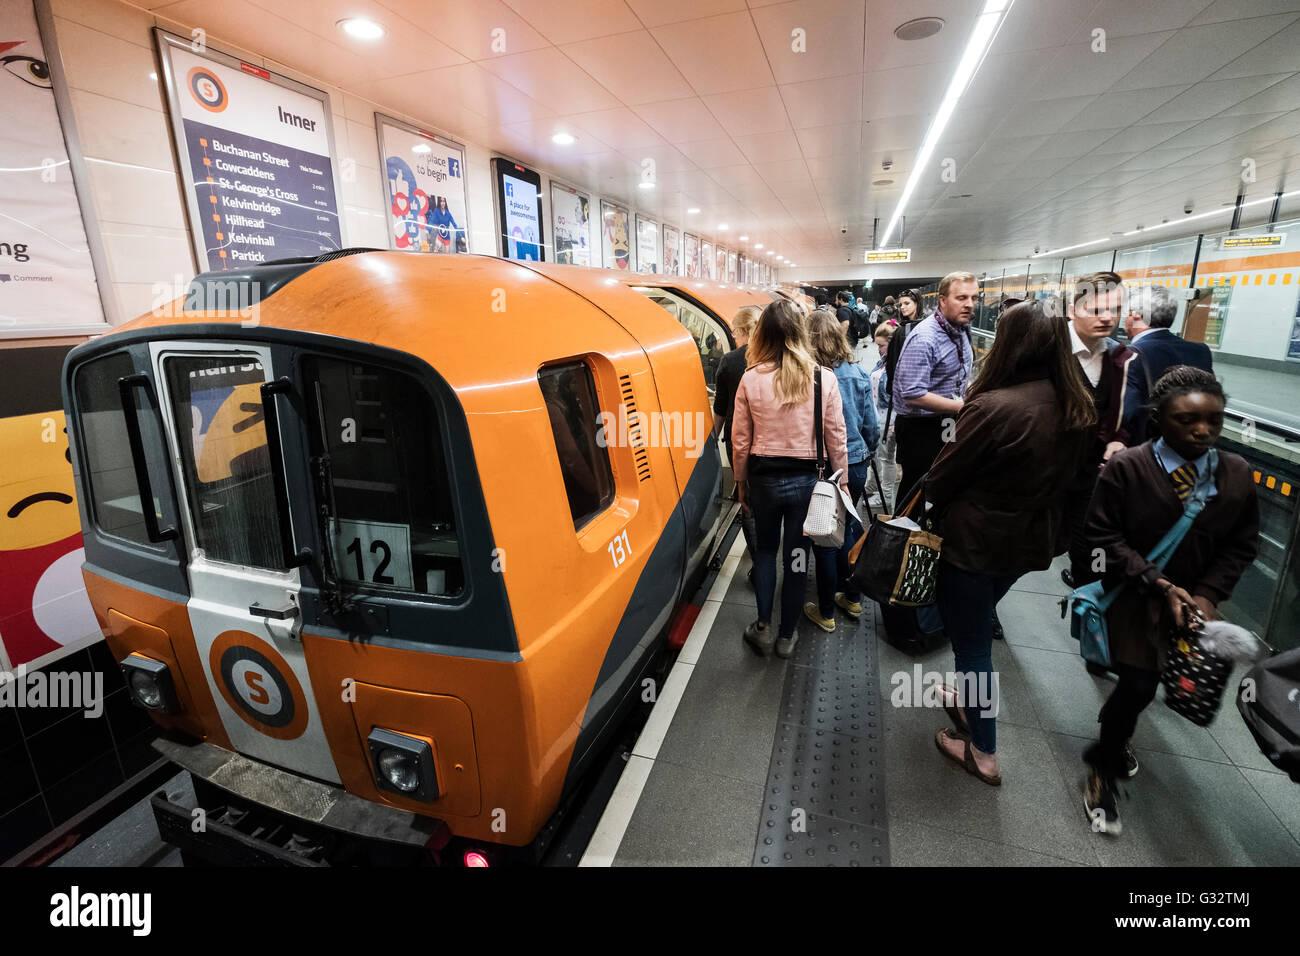 Platform at Buchanan Street station on Glasgow Underground system in Glasgow, Scotland, United Kingdom - Stock Image